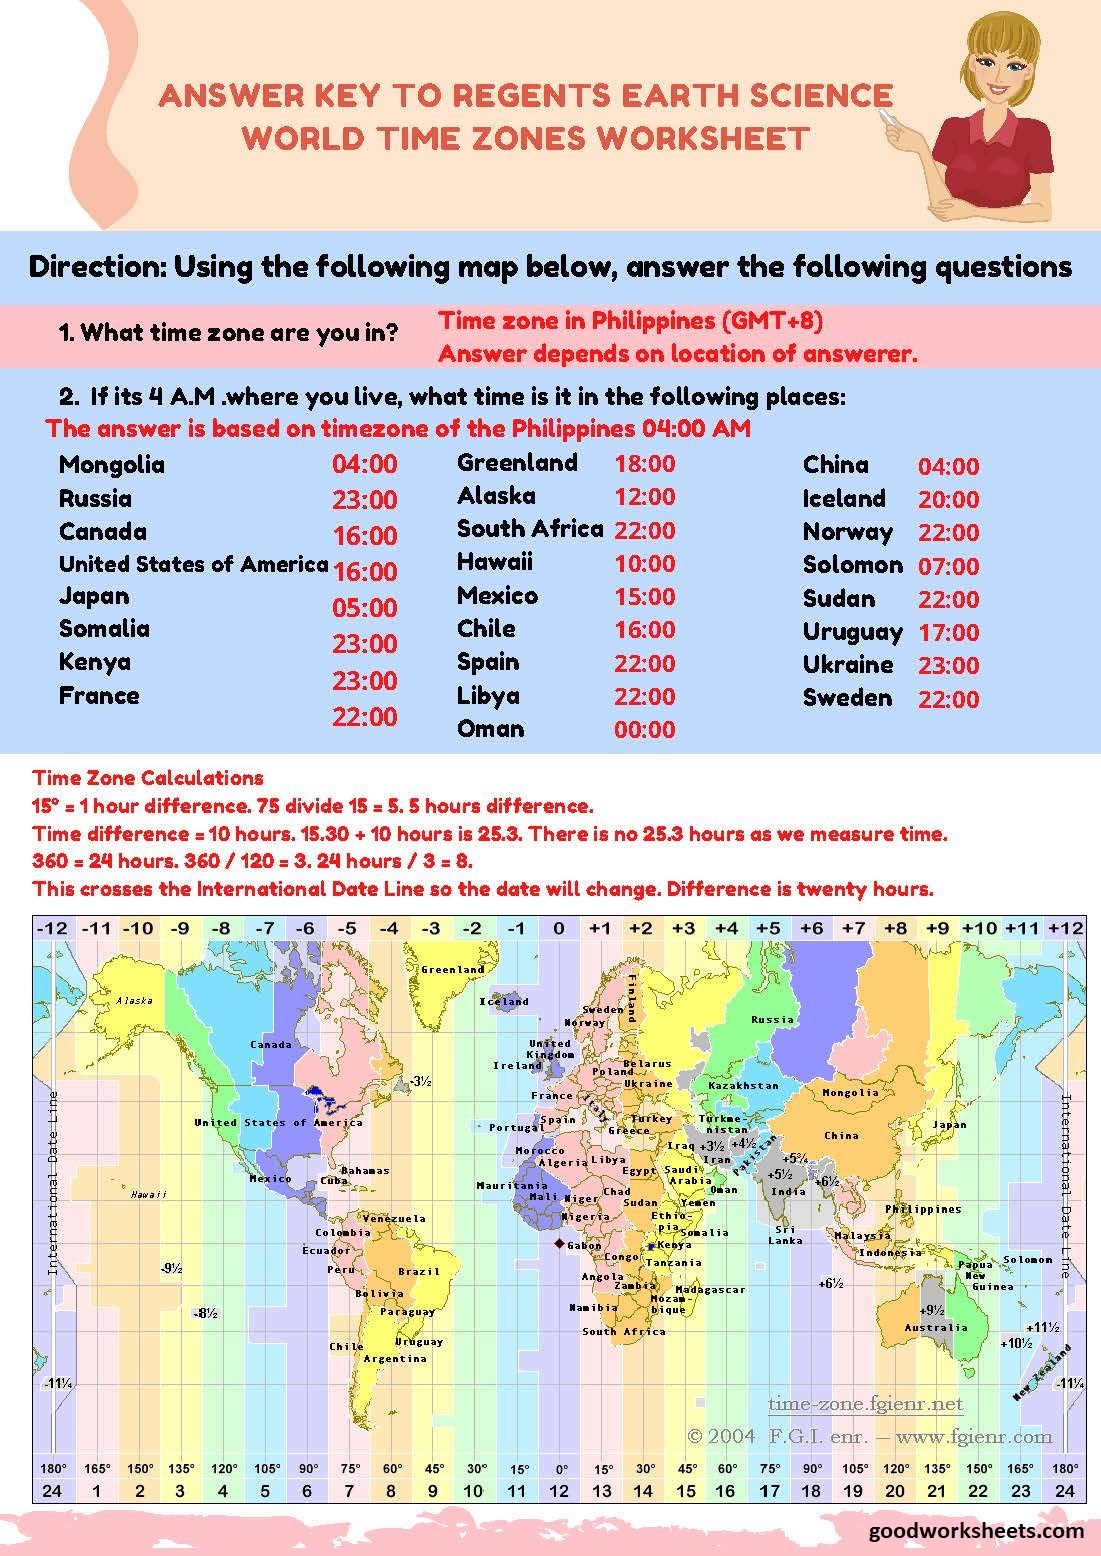 Regents Earth Science World Time Zones Worksheets